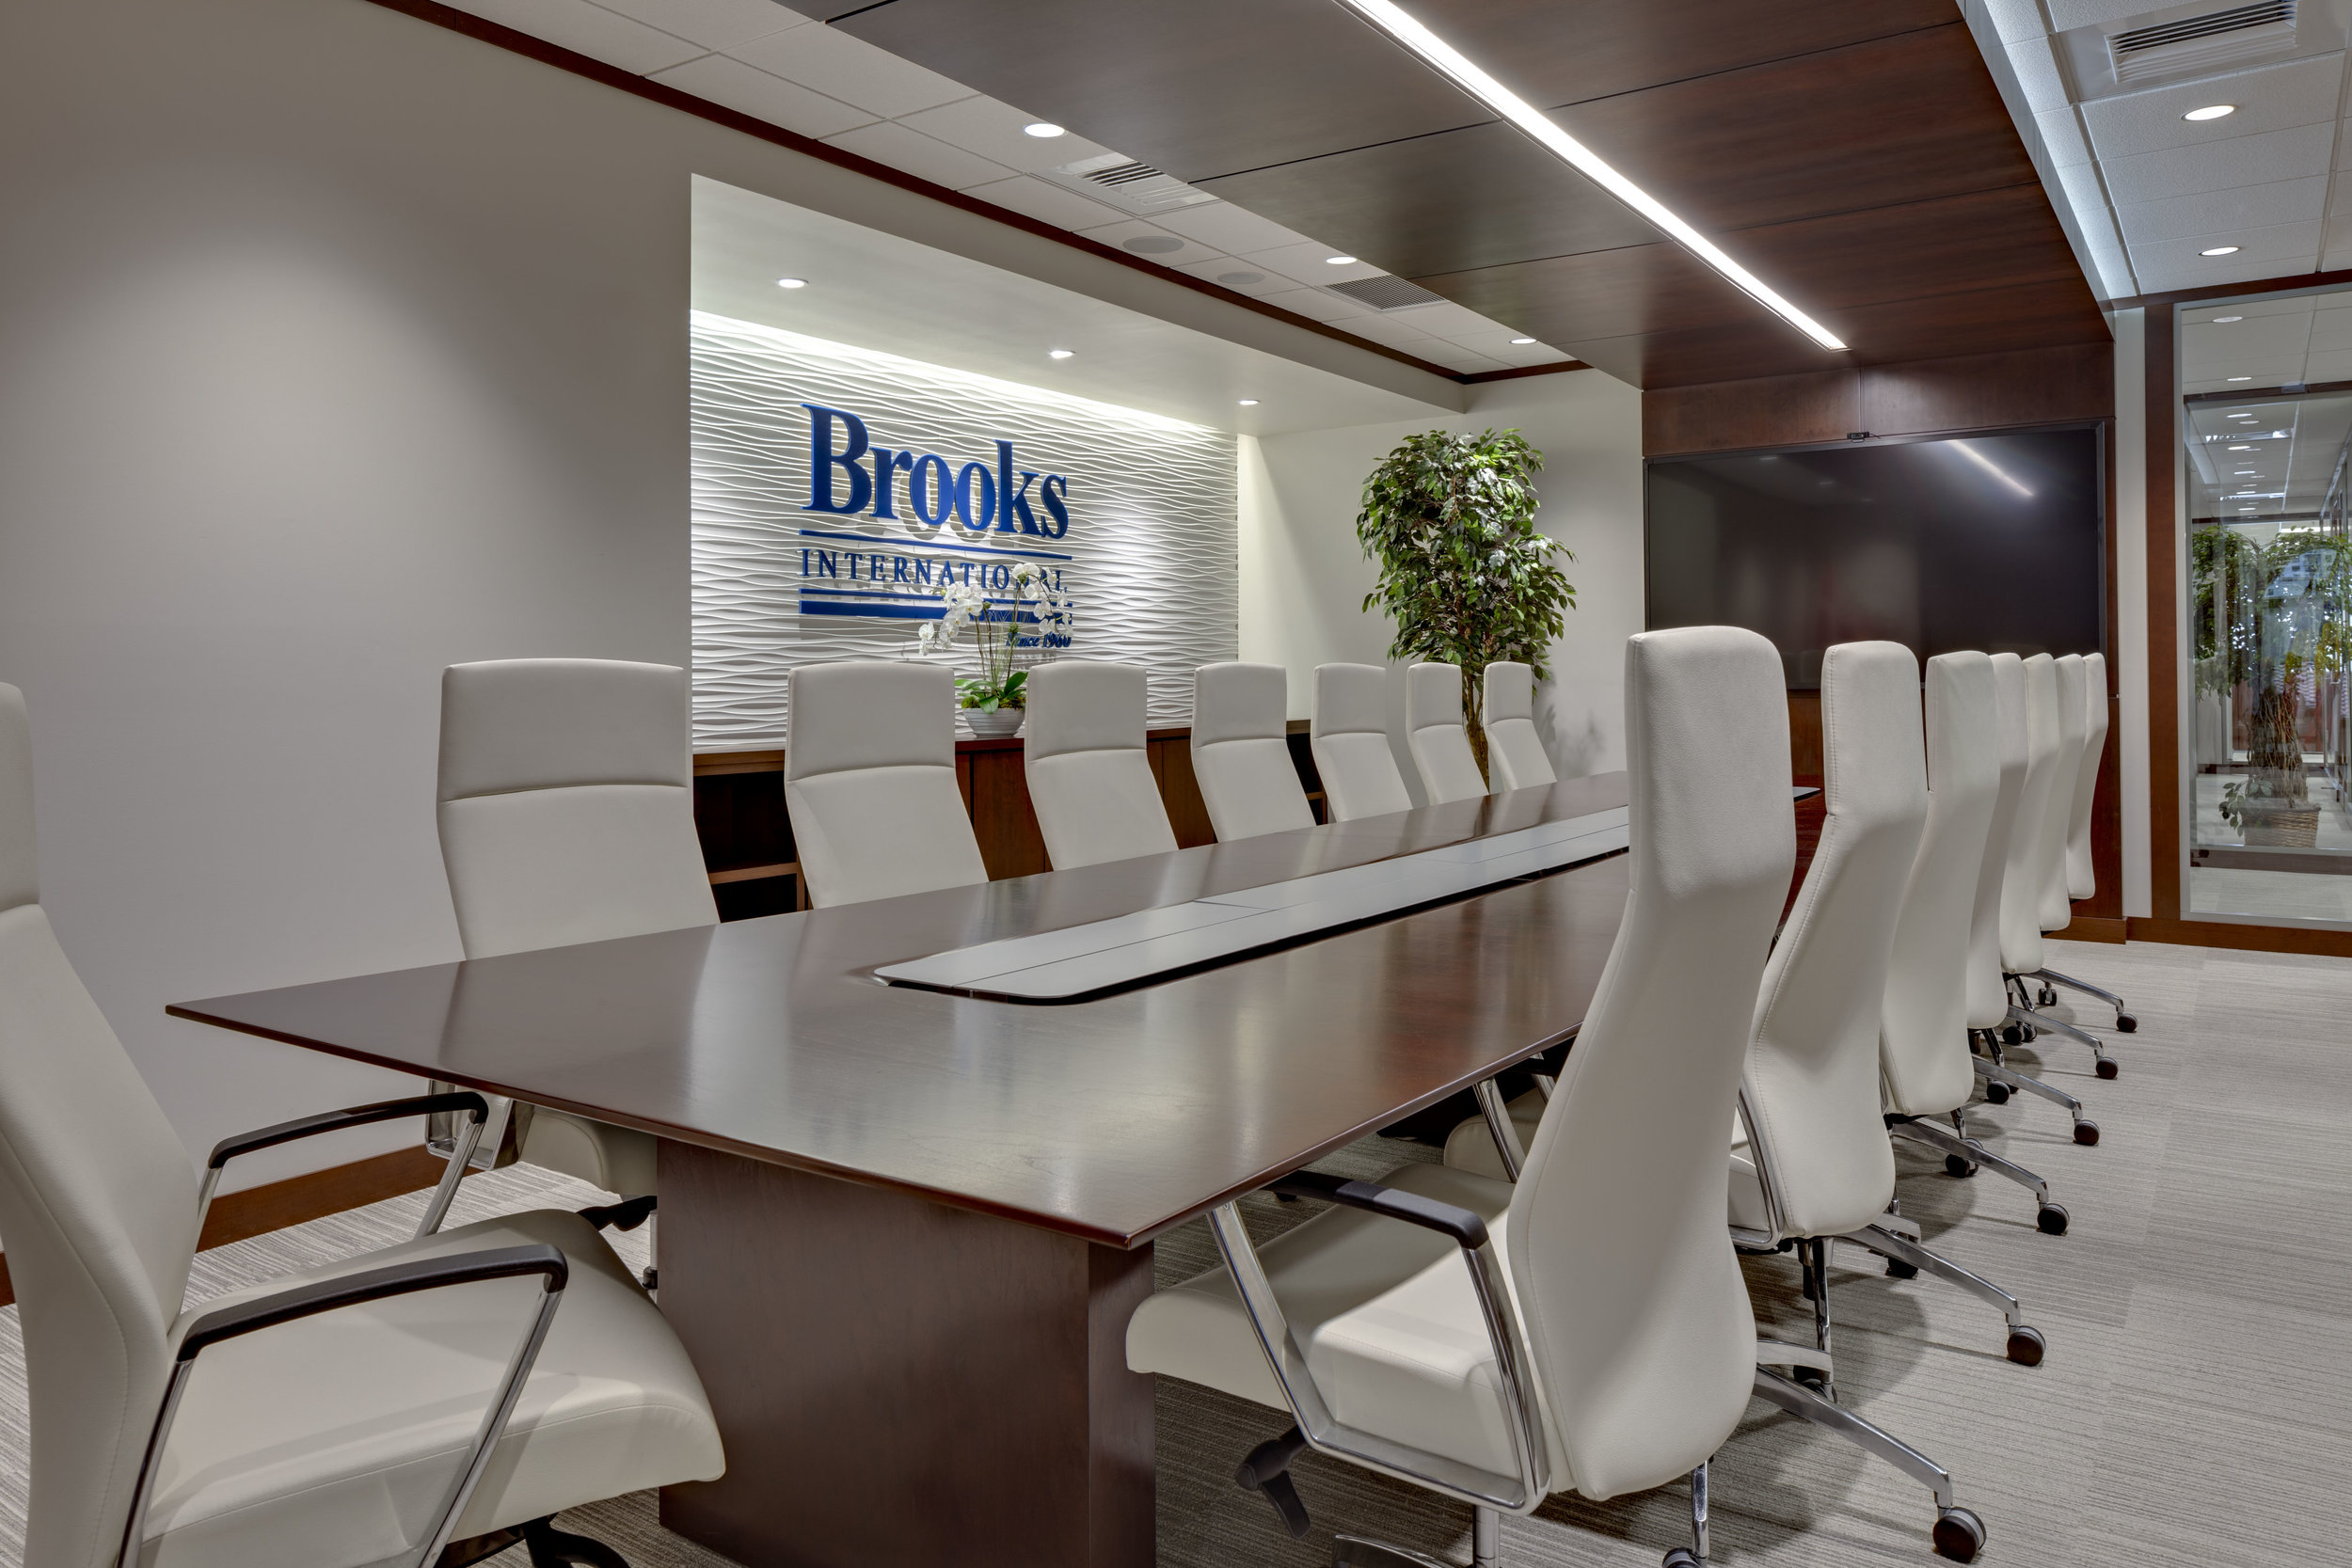 Brooks-Conf1.jpg